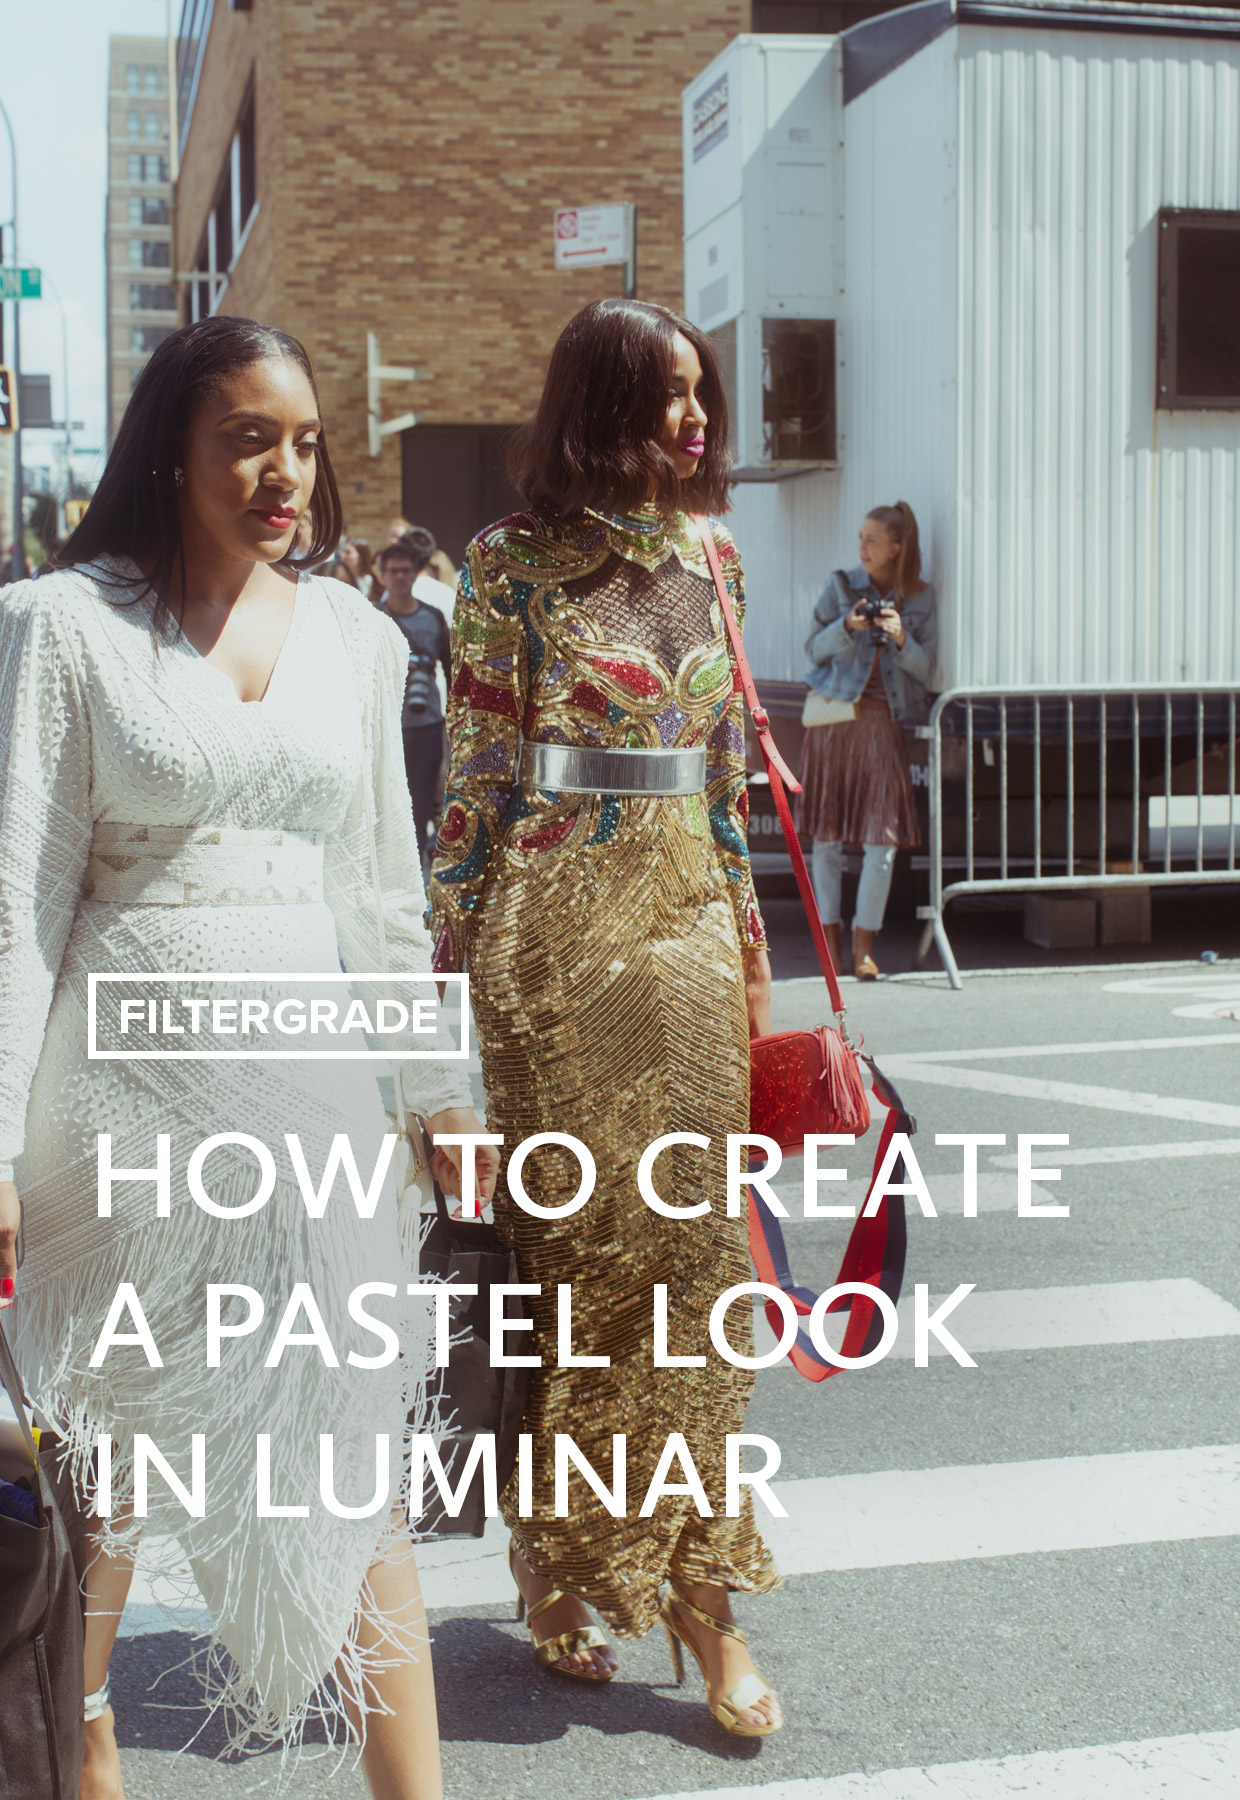 Pastel Look Tutorial for Luminar